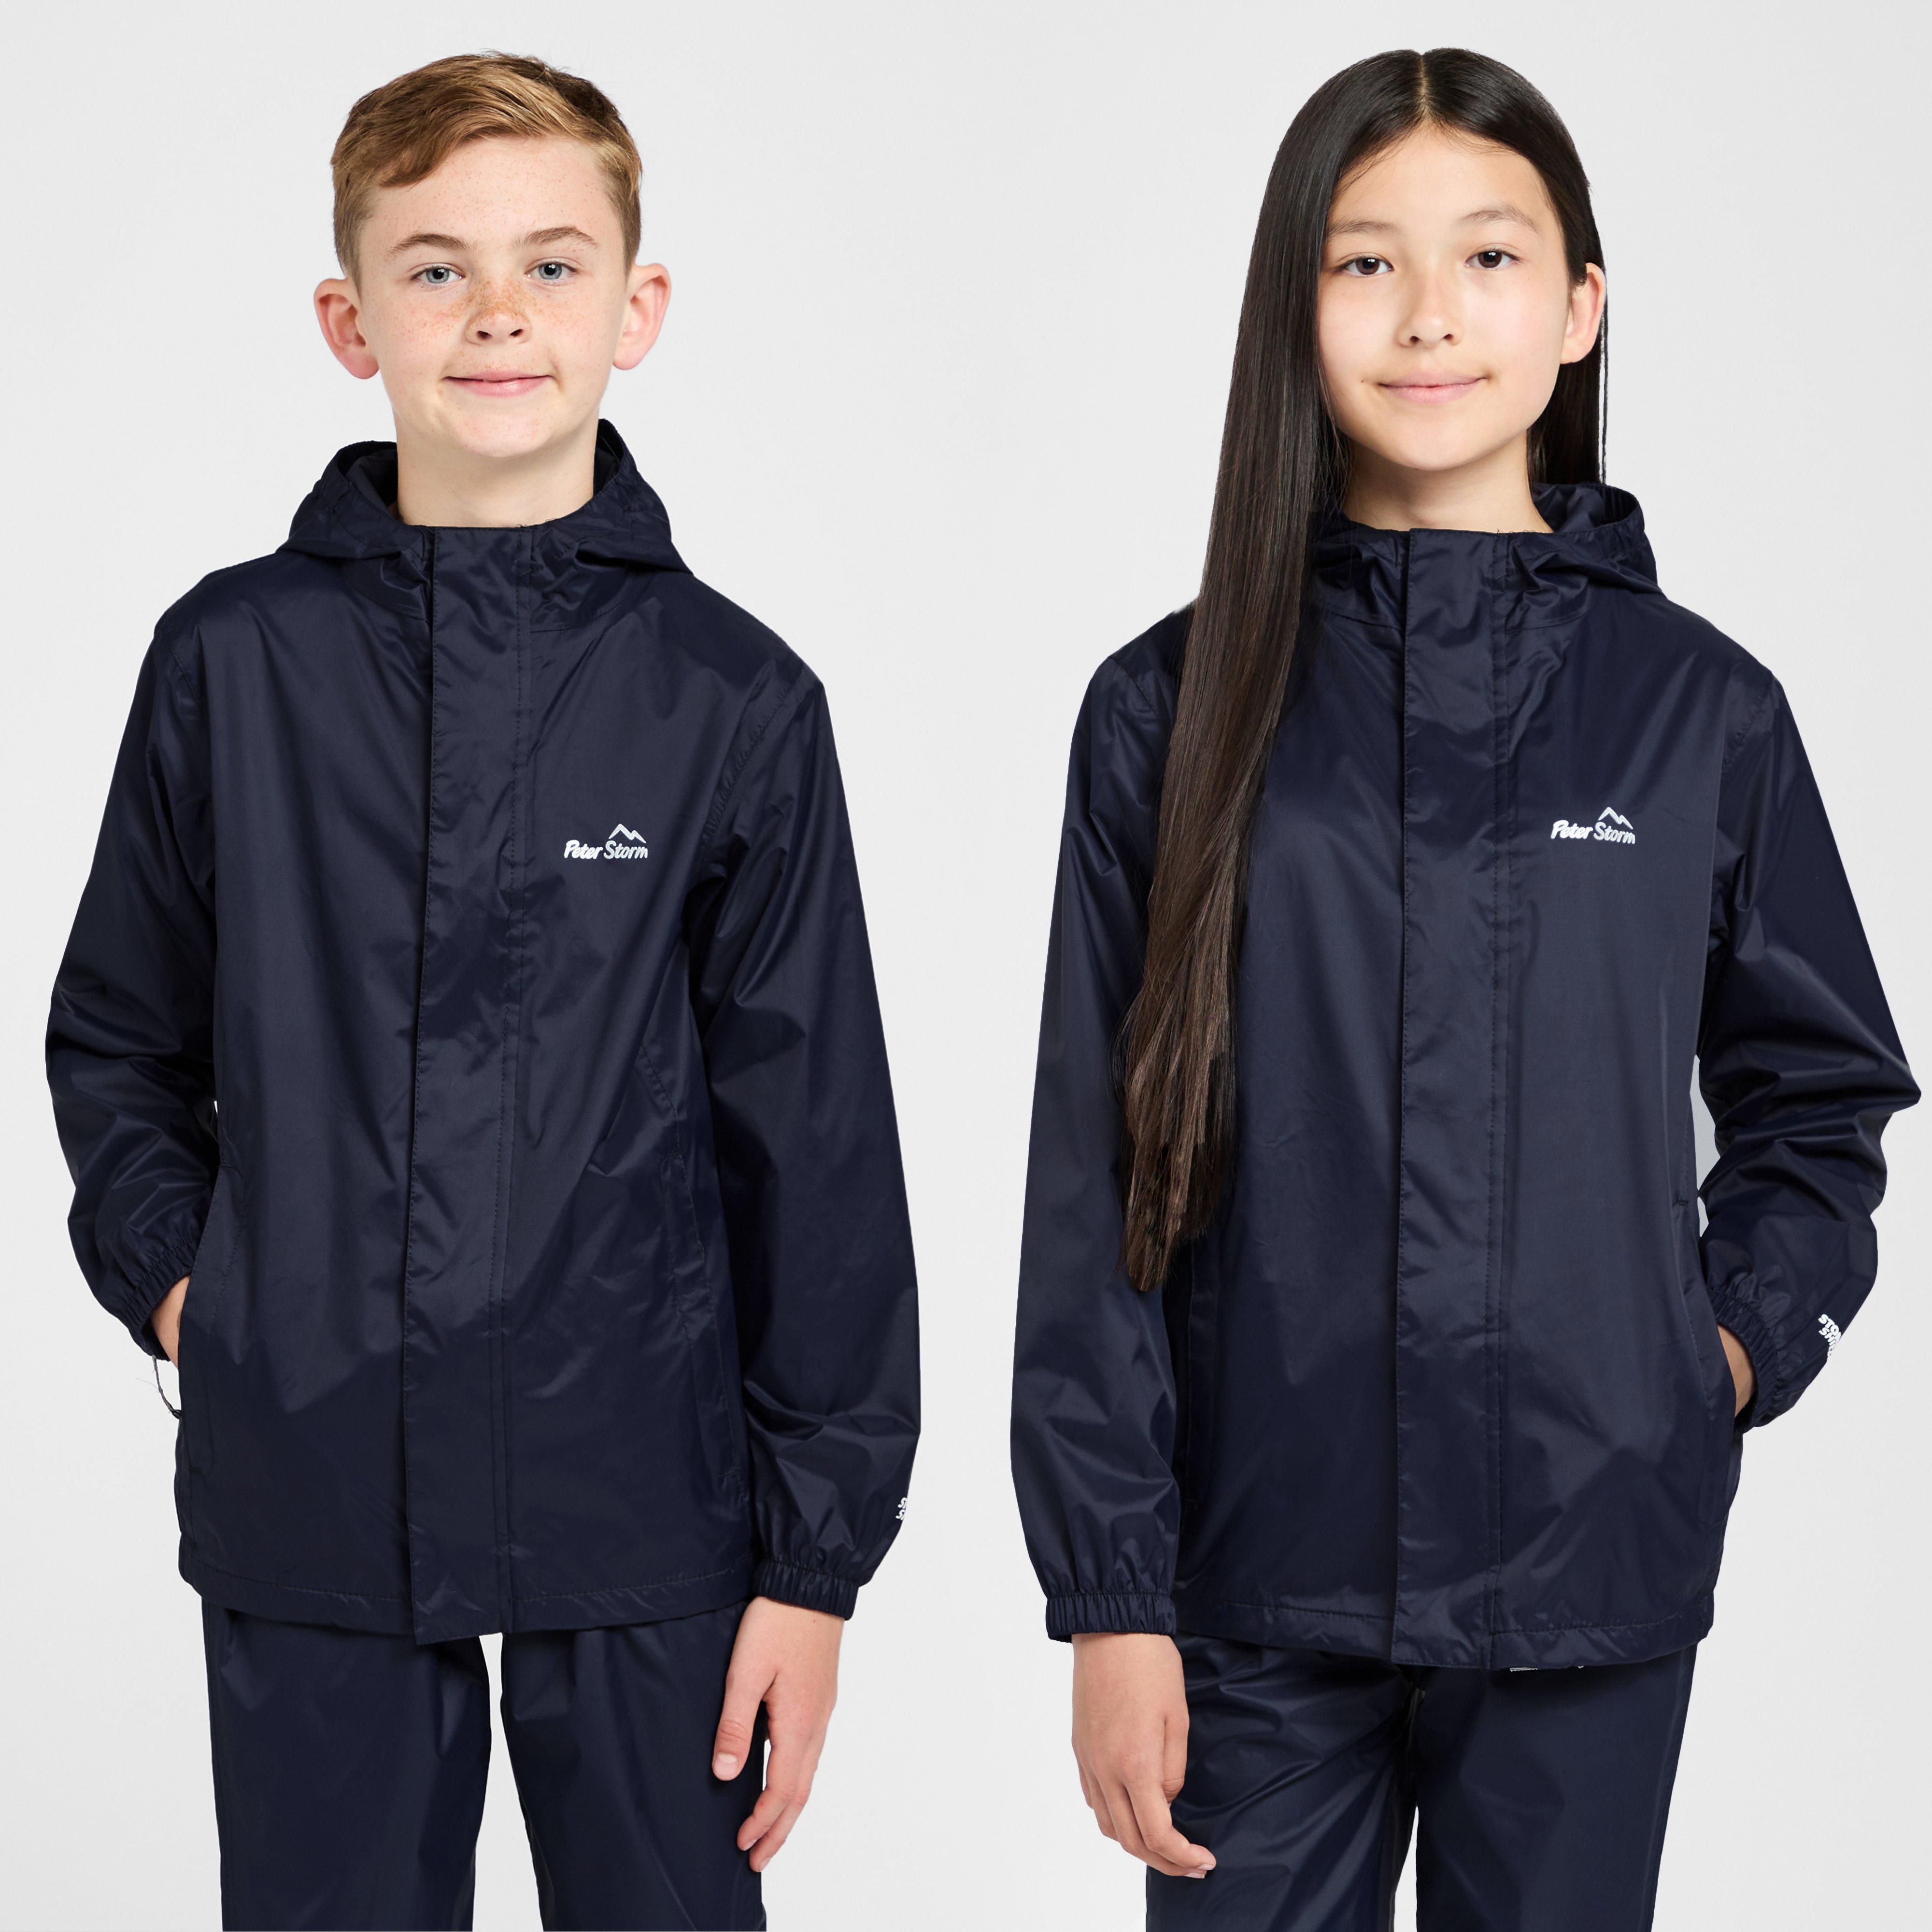 Image of Peter Storm Kids' Unisex Packable Waterproof Jacket - Blue/Blue, Blue/Blue